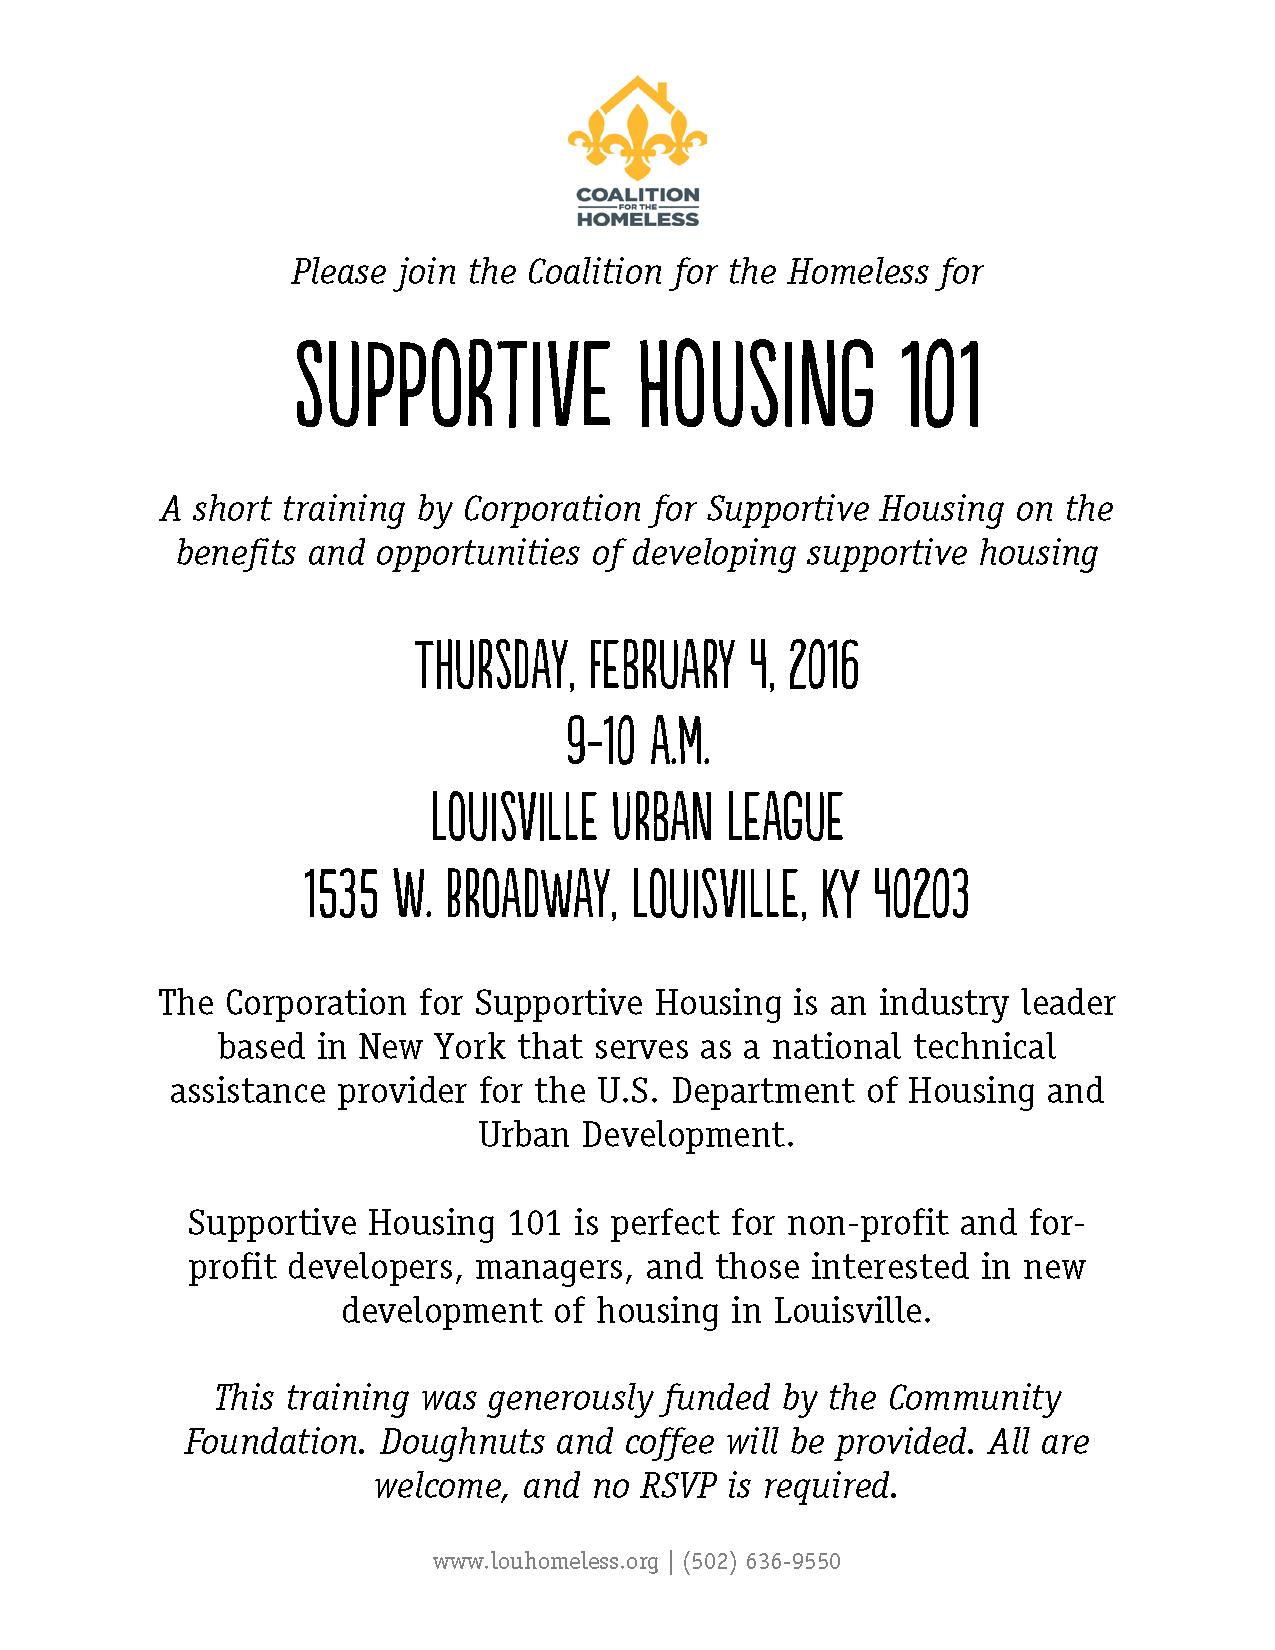 Supportive Housing 101 - reschedule